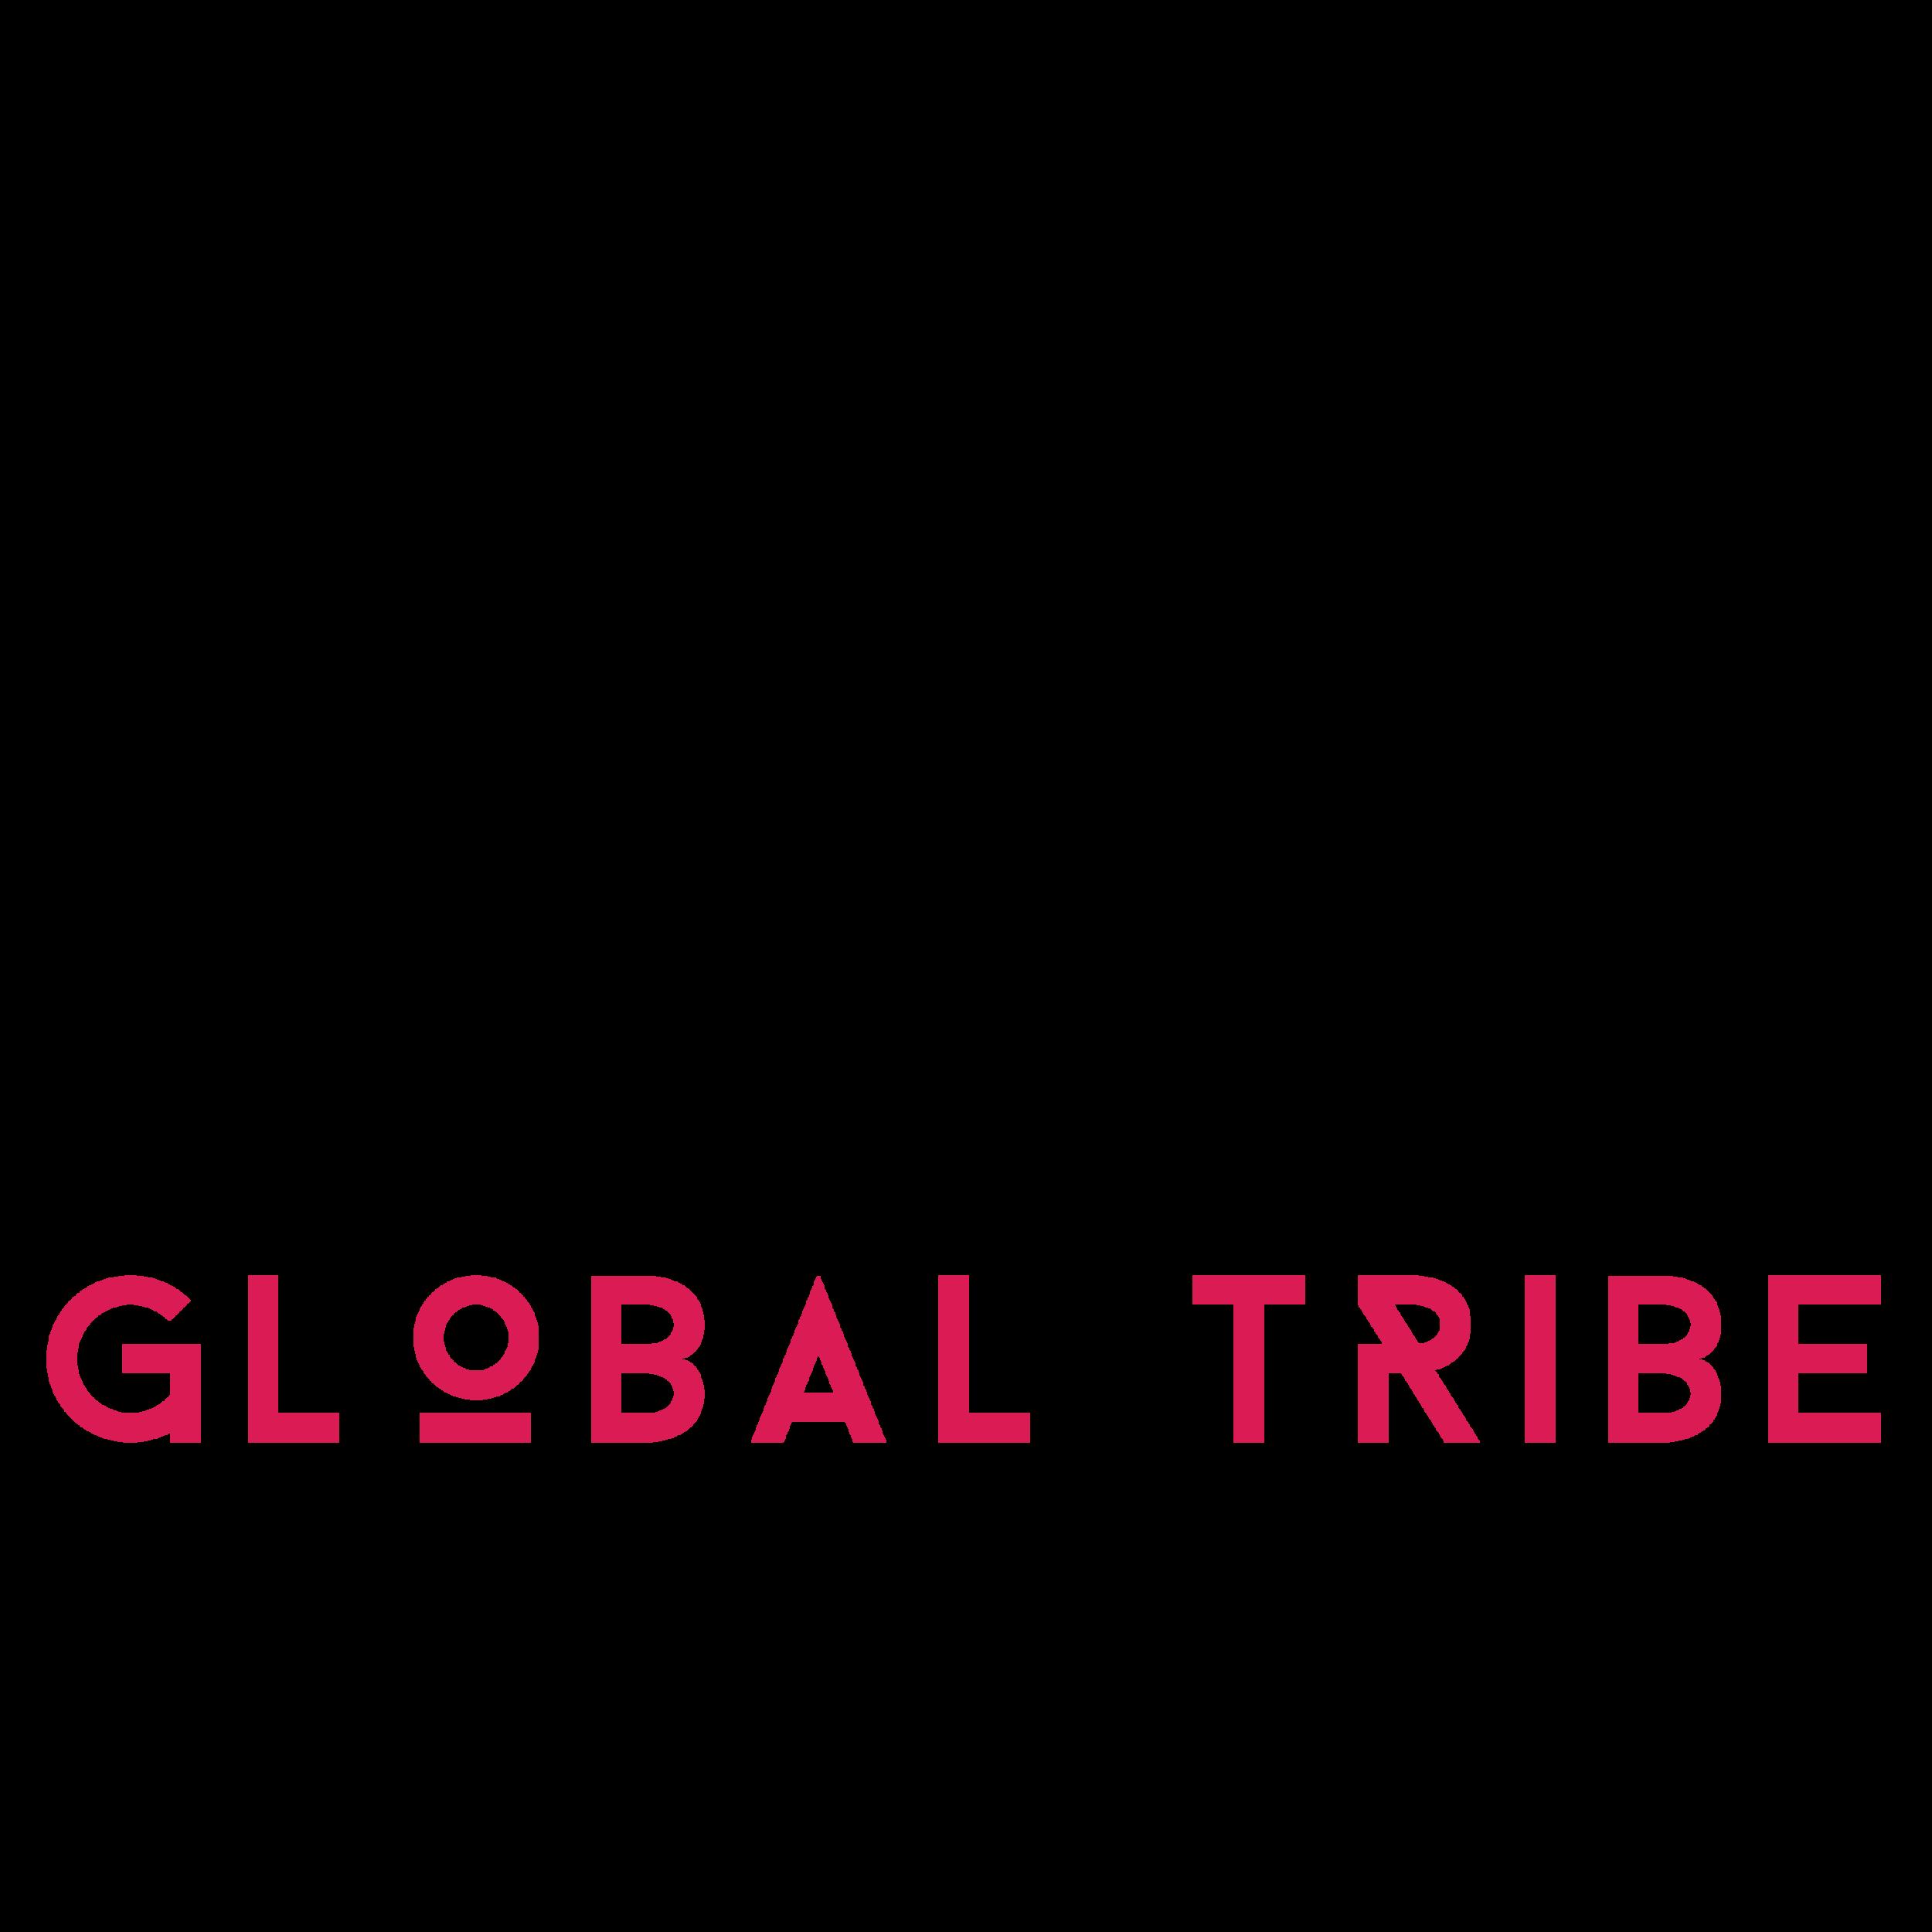 Global-Tribe-logo-final.png